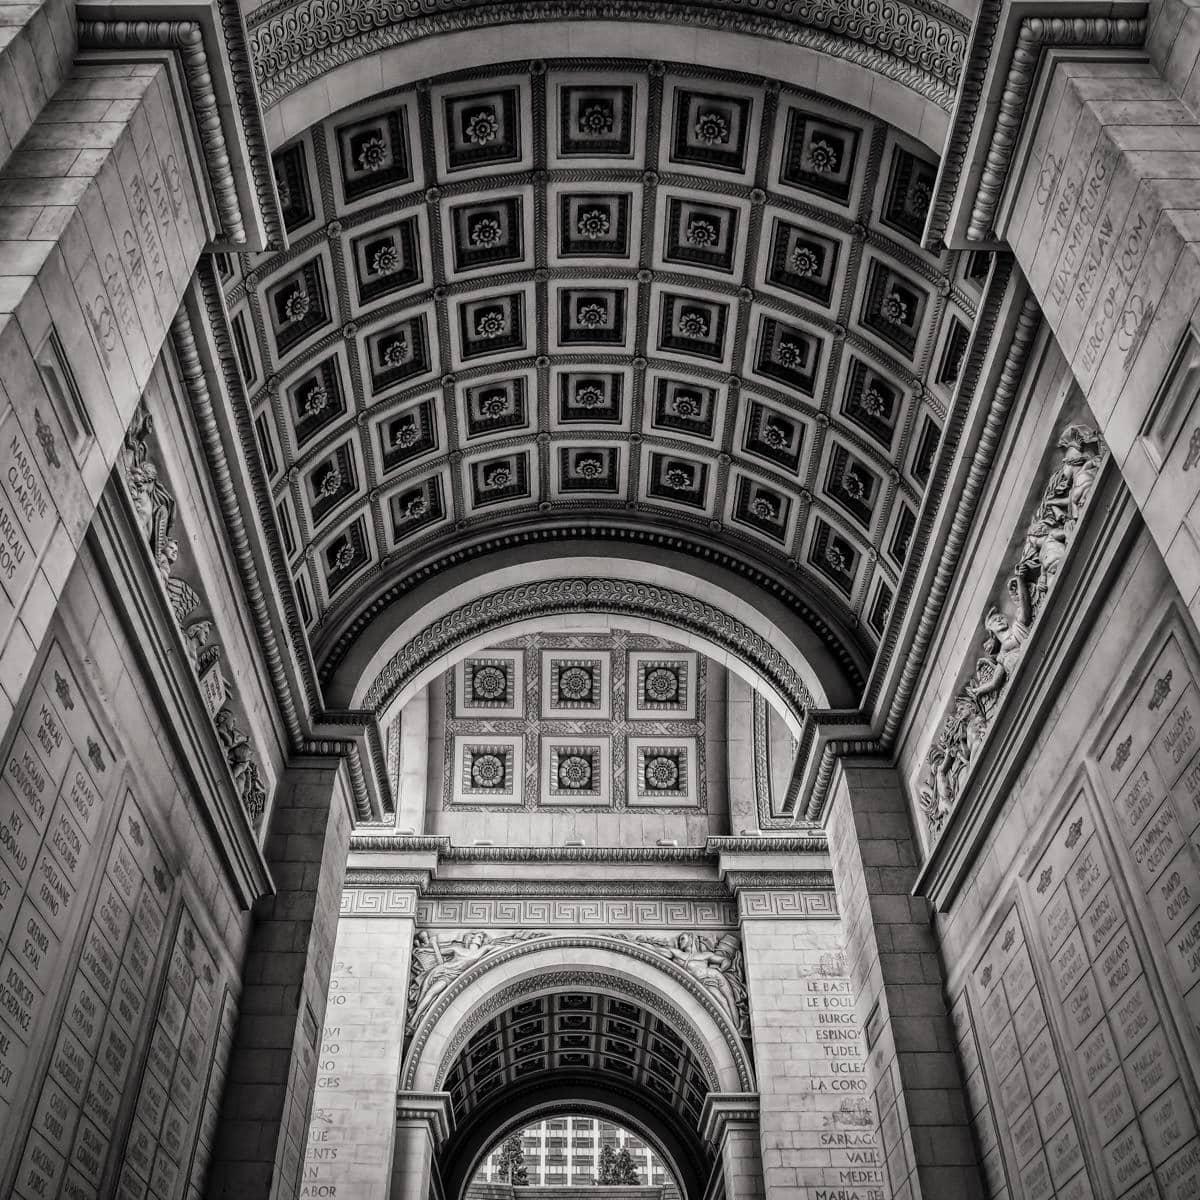 Architectural detail of the replica Arc de Triomphe at Paris Hotel & Casino in Las Vegas.